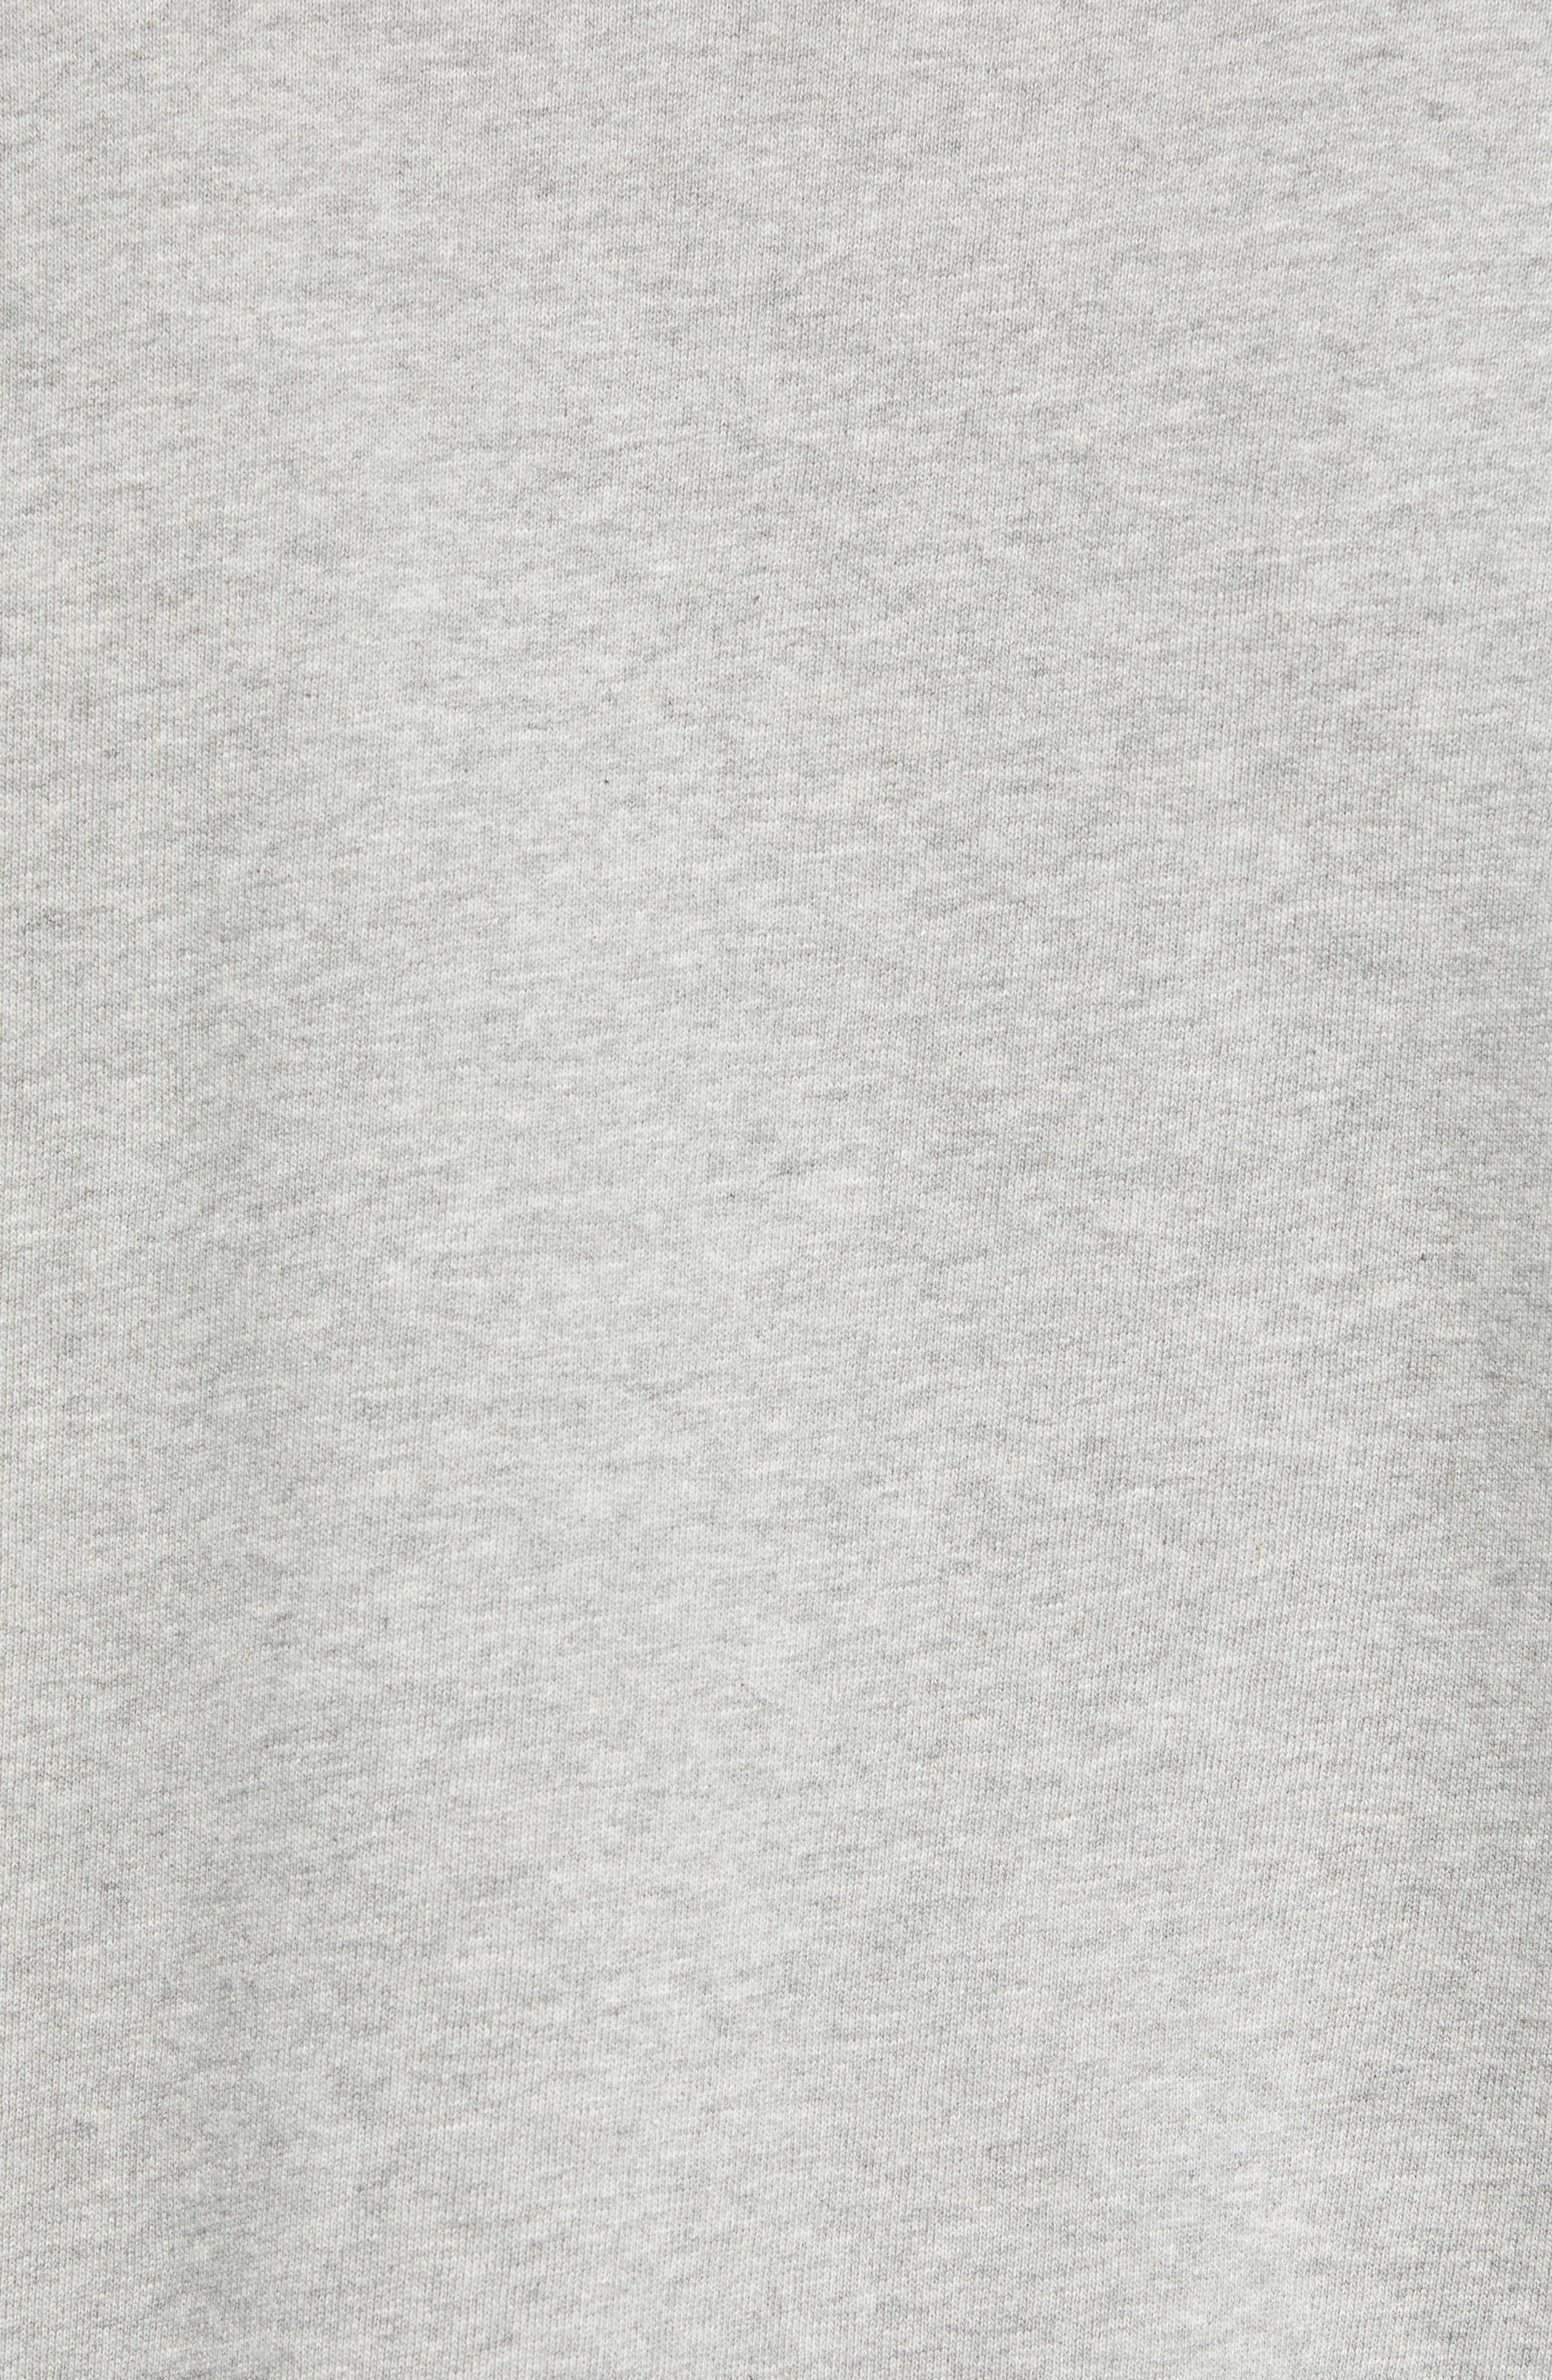 Aim French Terry Raglan Sweatshirt,                             Alternate thumbnail 5, color,                             GREY MELANGE